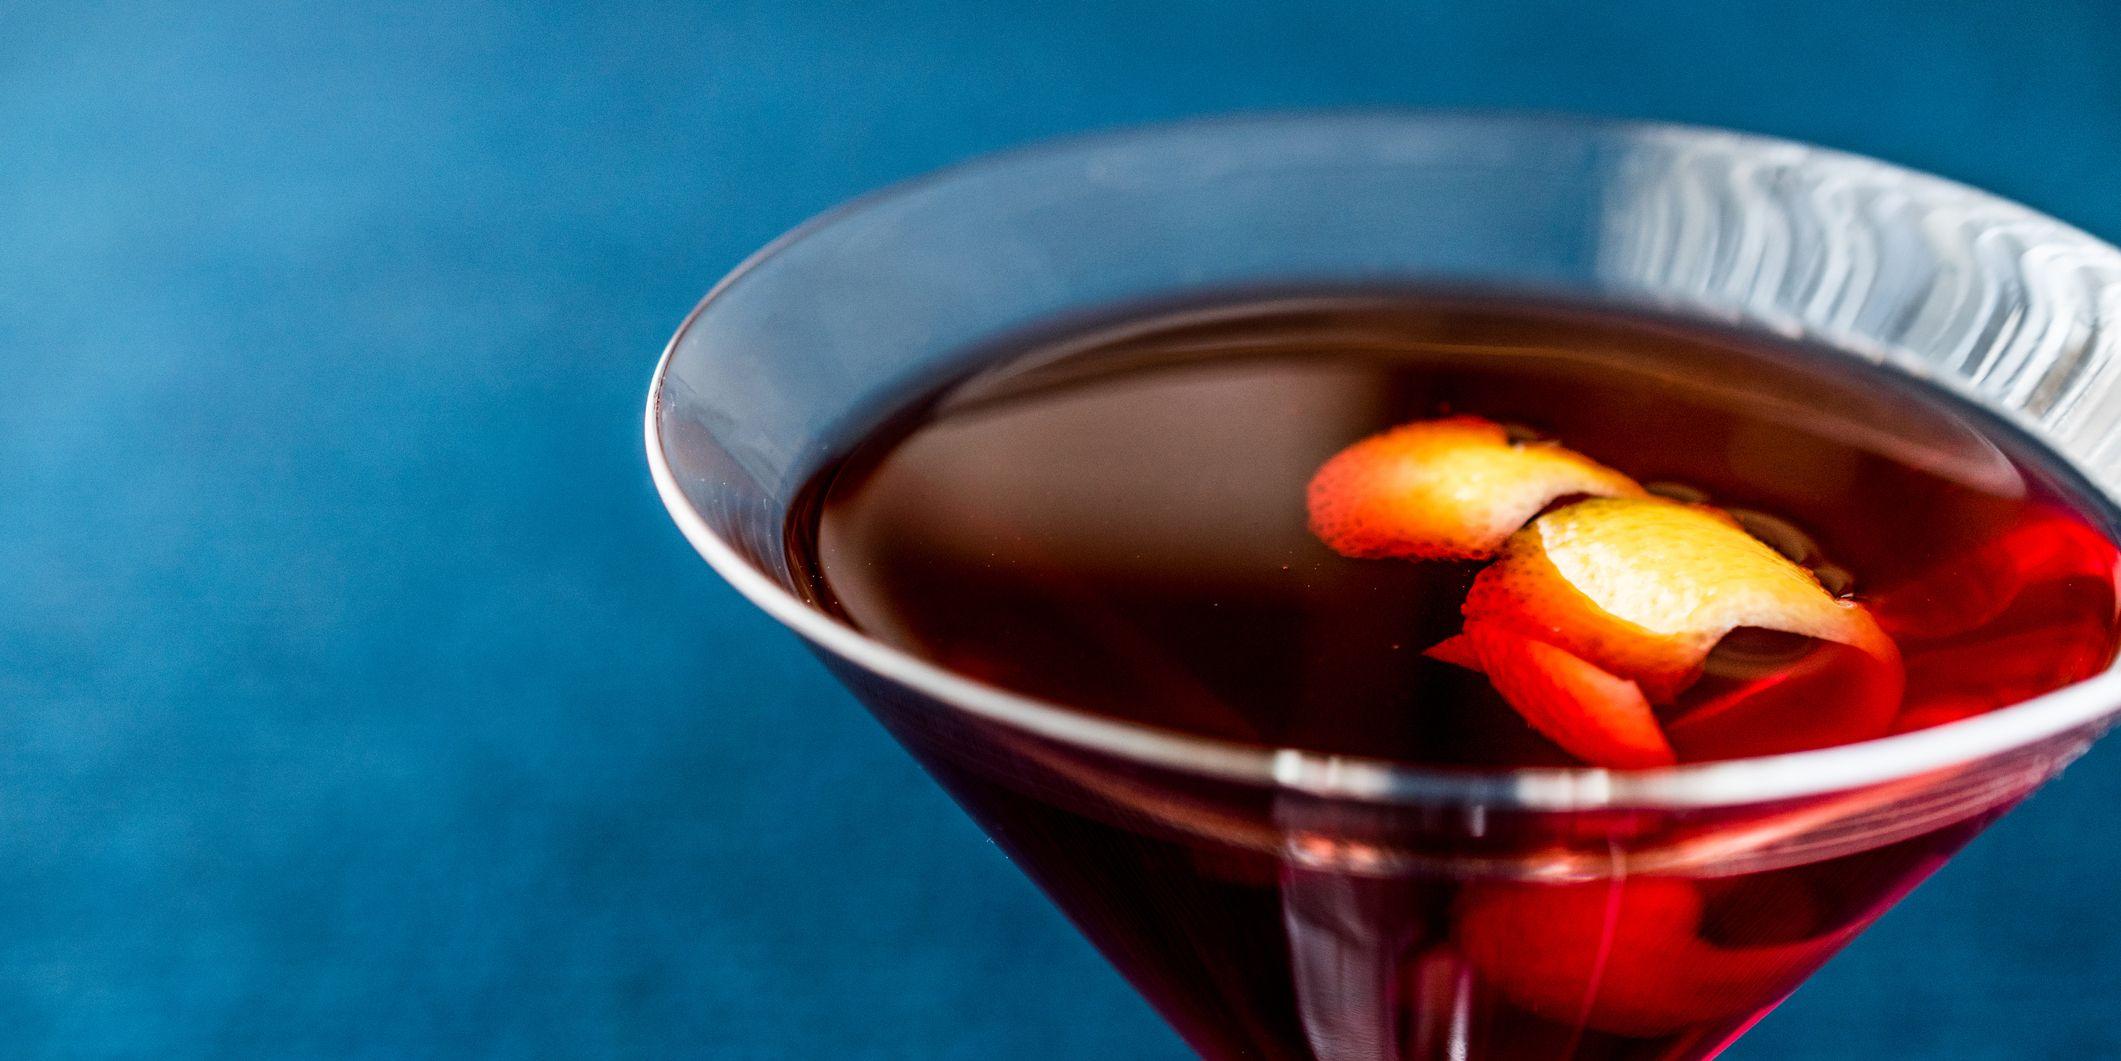 Manhattan Cocktail with orange peel.